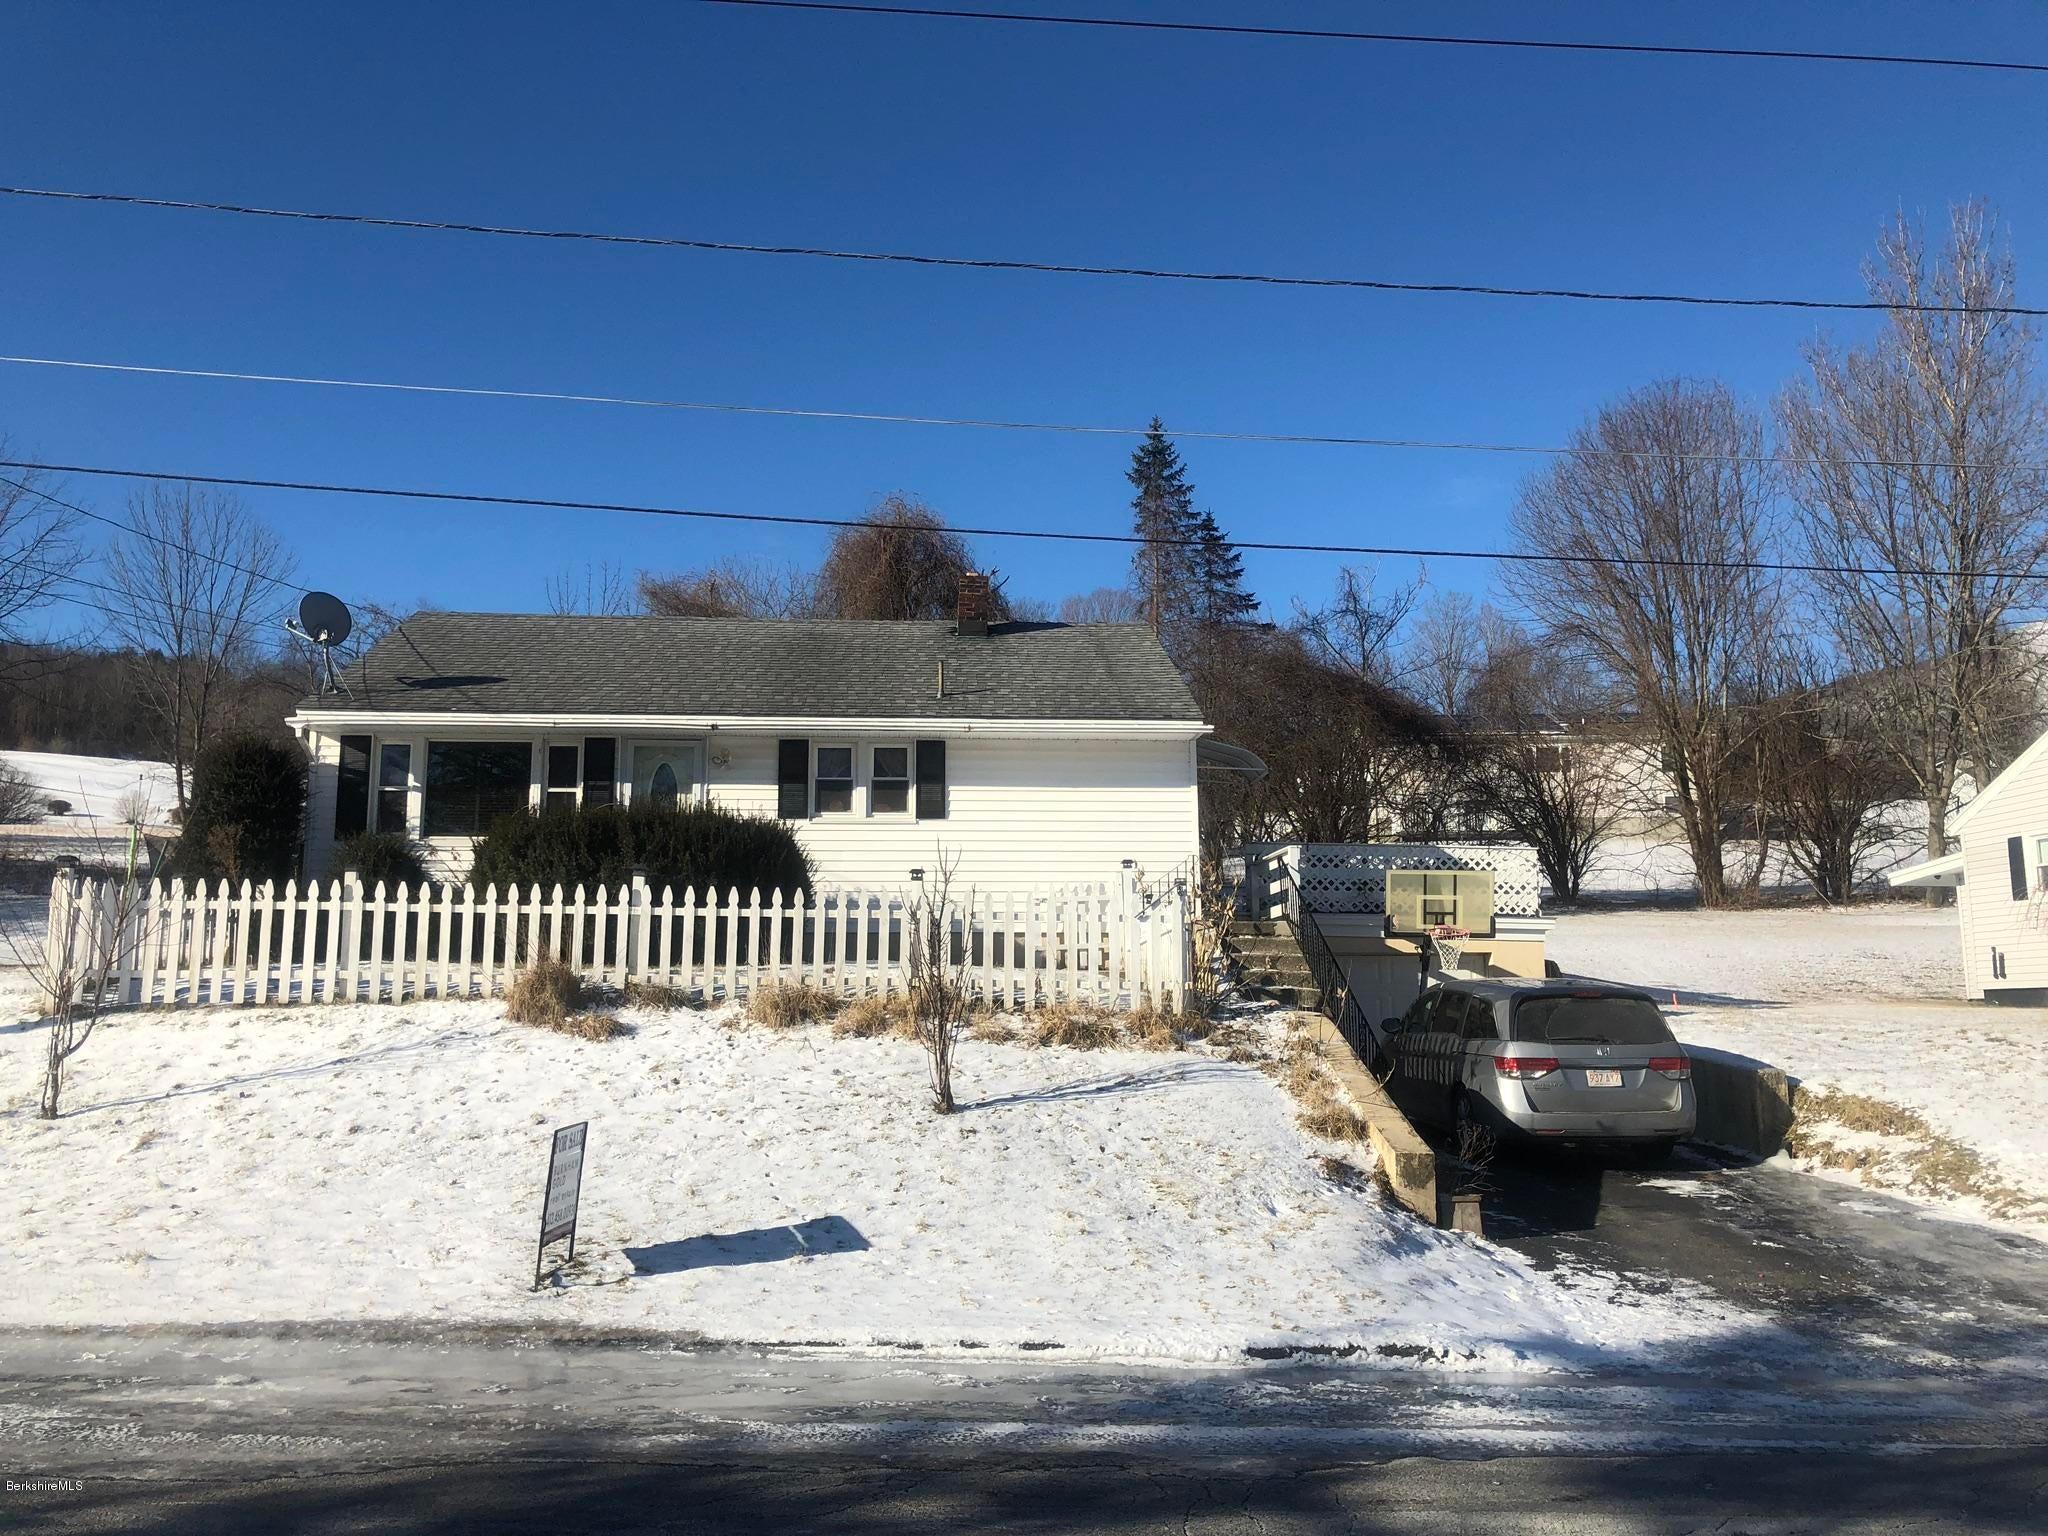 8 Bieniek Ave, Adams, MA 01220